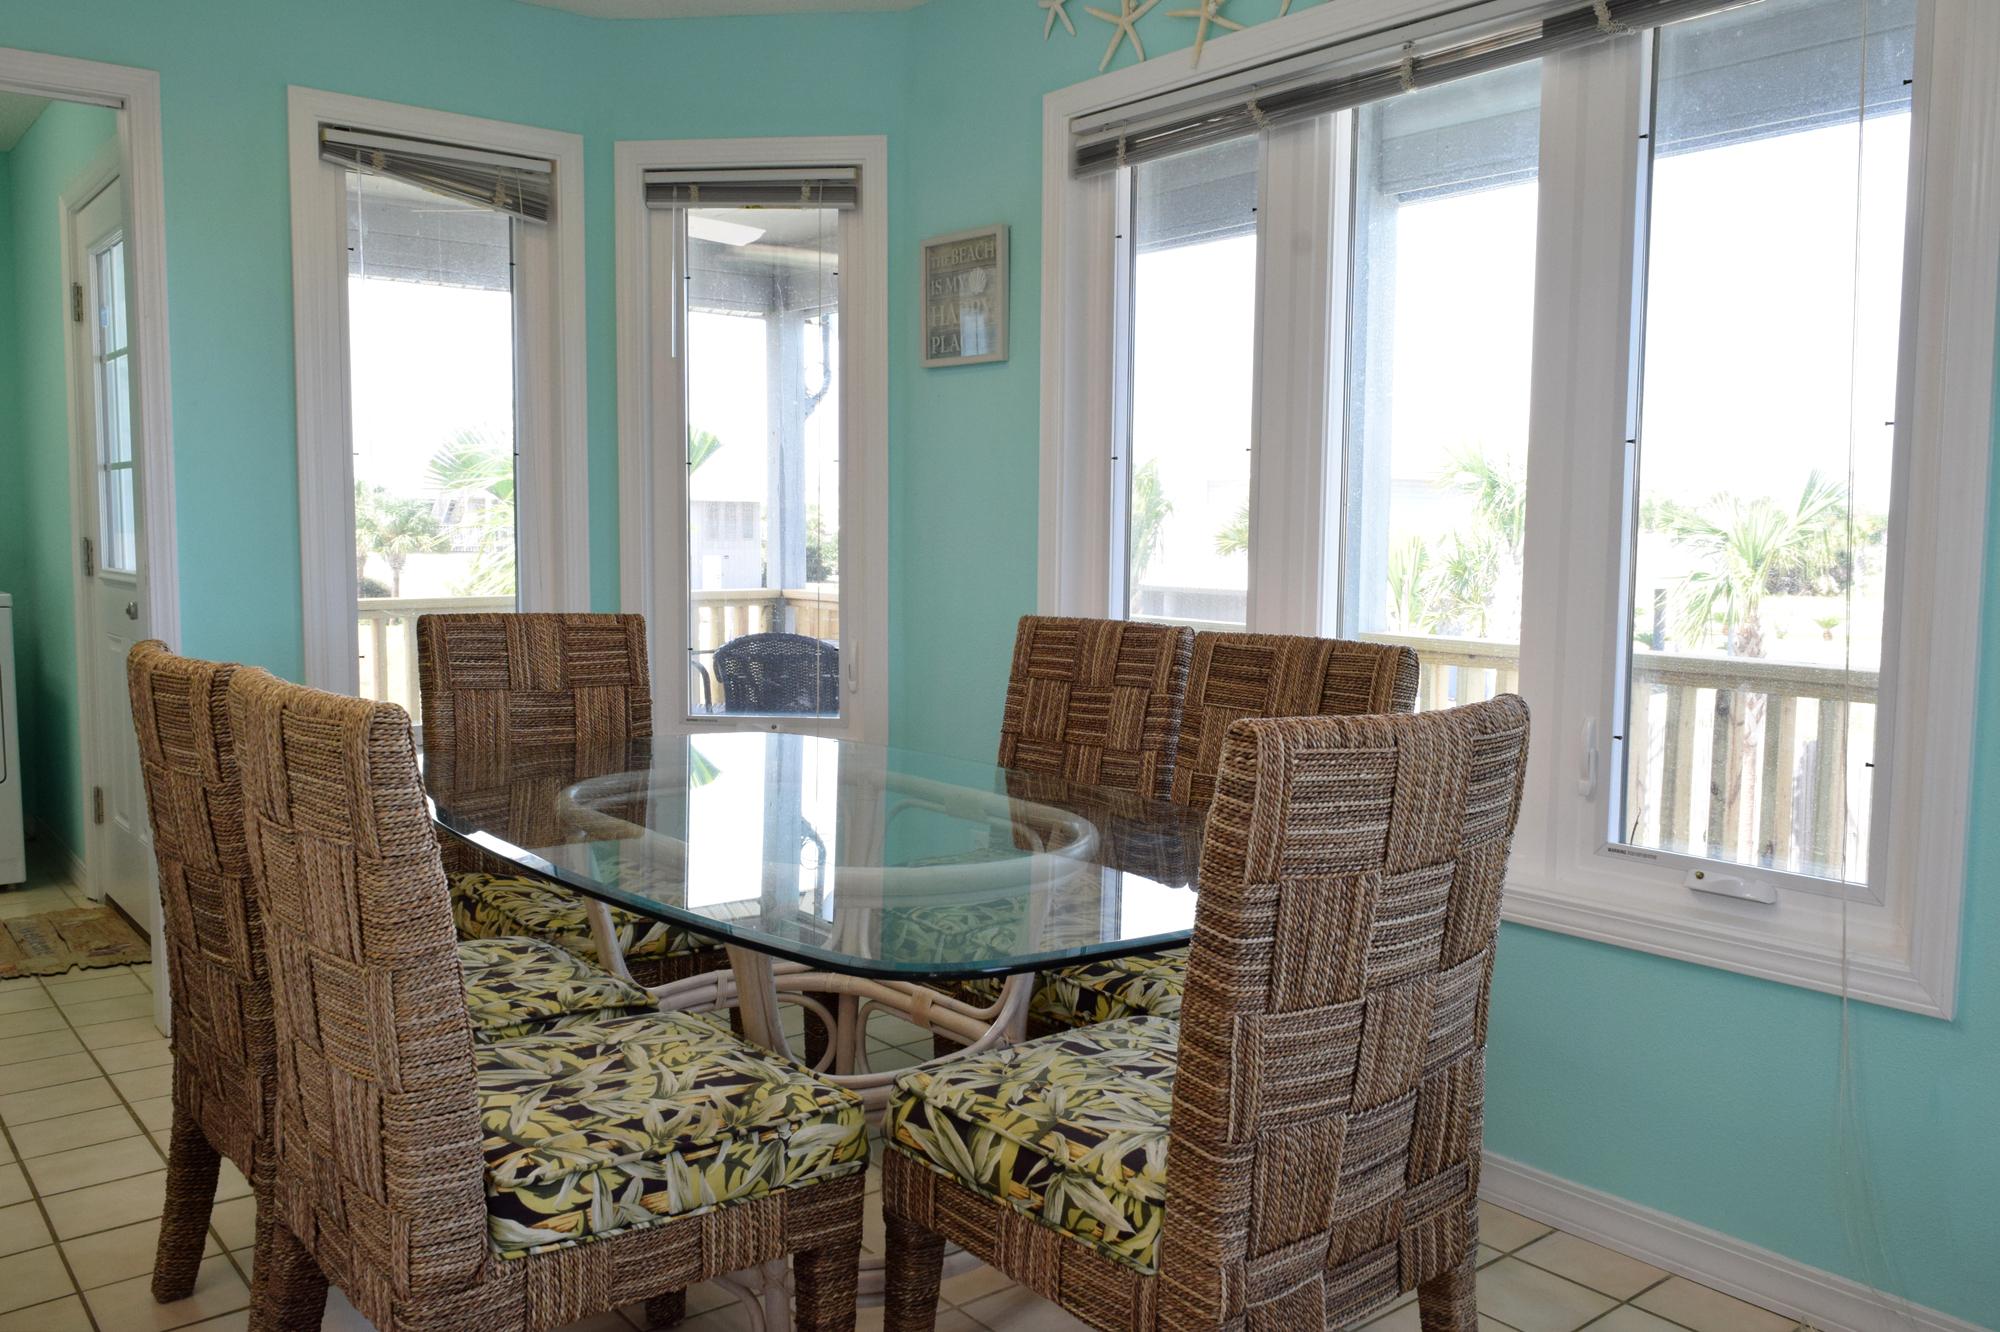 Maldonado 1103 House/Cottage rental in Pensacola Beach House Rentals in Pensacola Beach Florida - #9